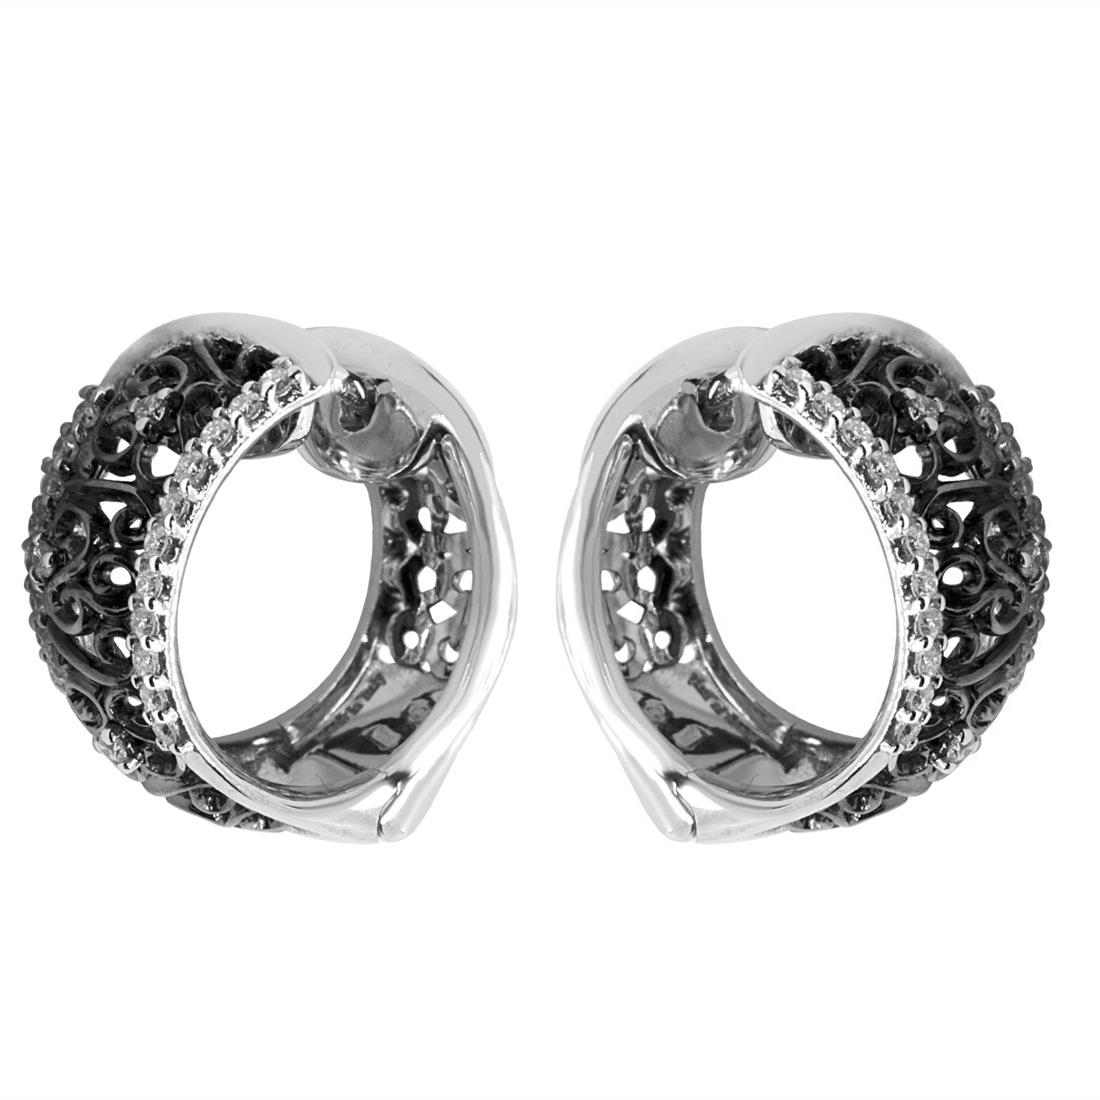 Orecchini Alfieri & St John con diamanti ct 0,43 - ALFIERI & ST. JOHN